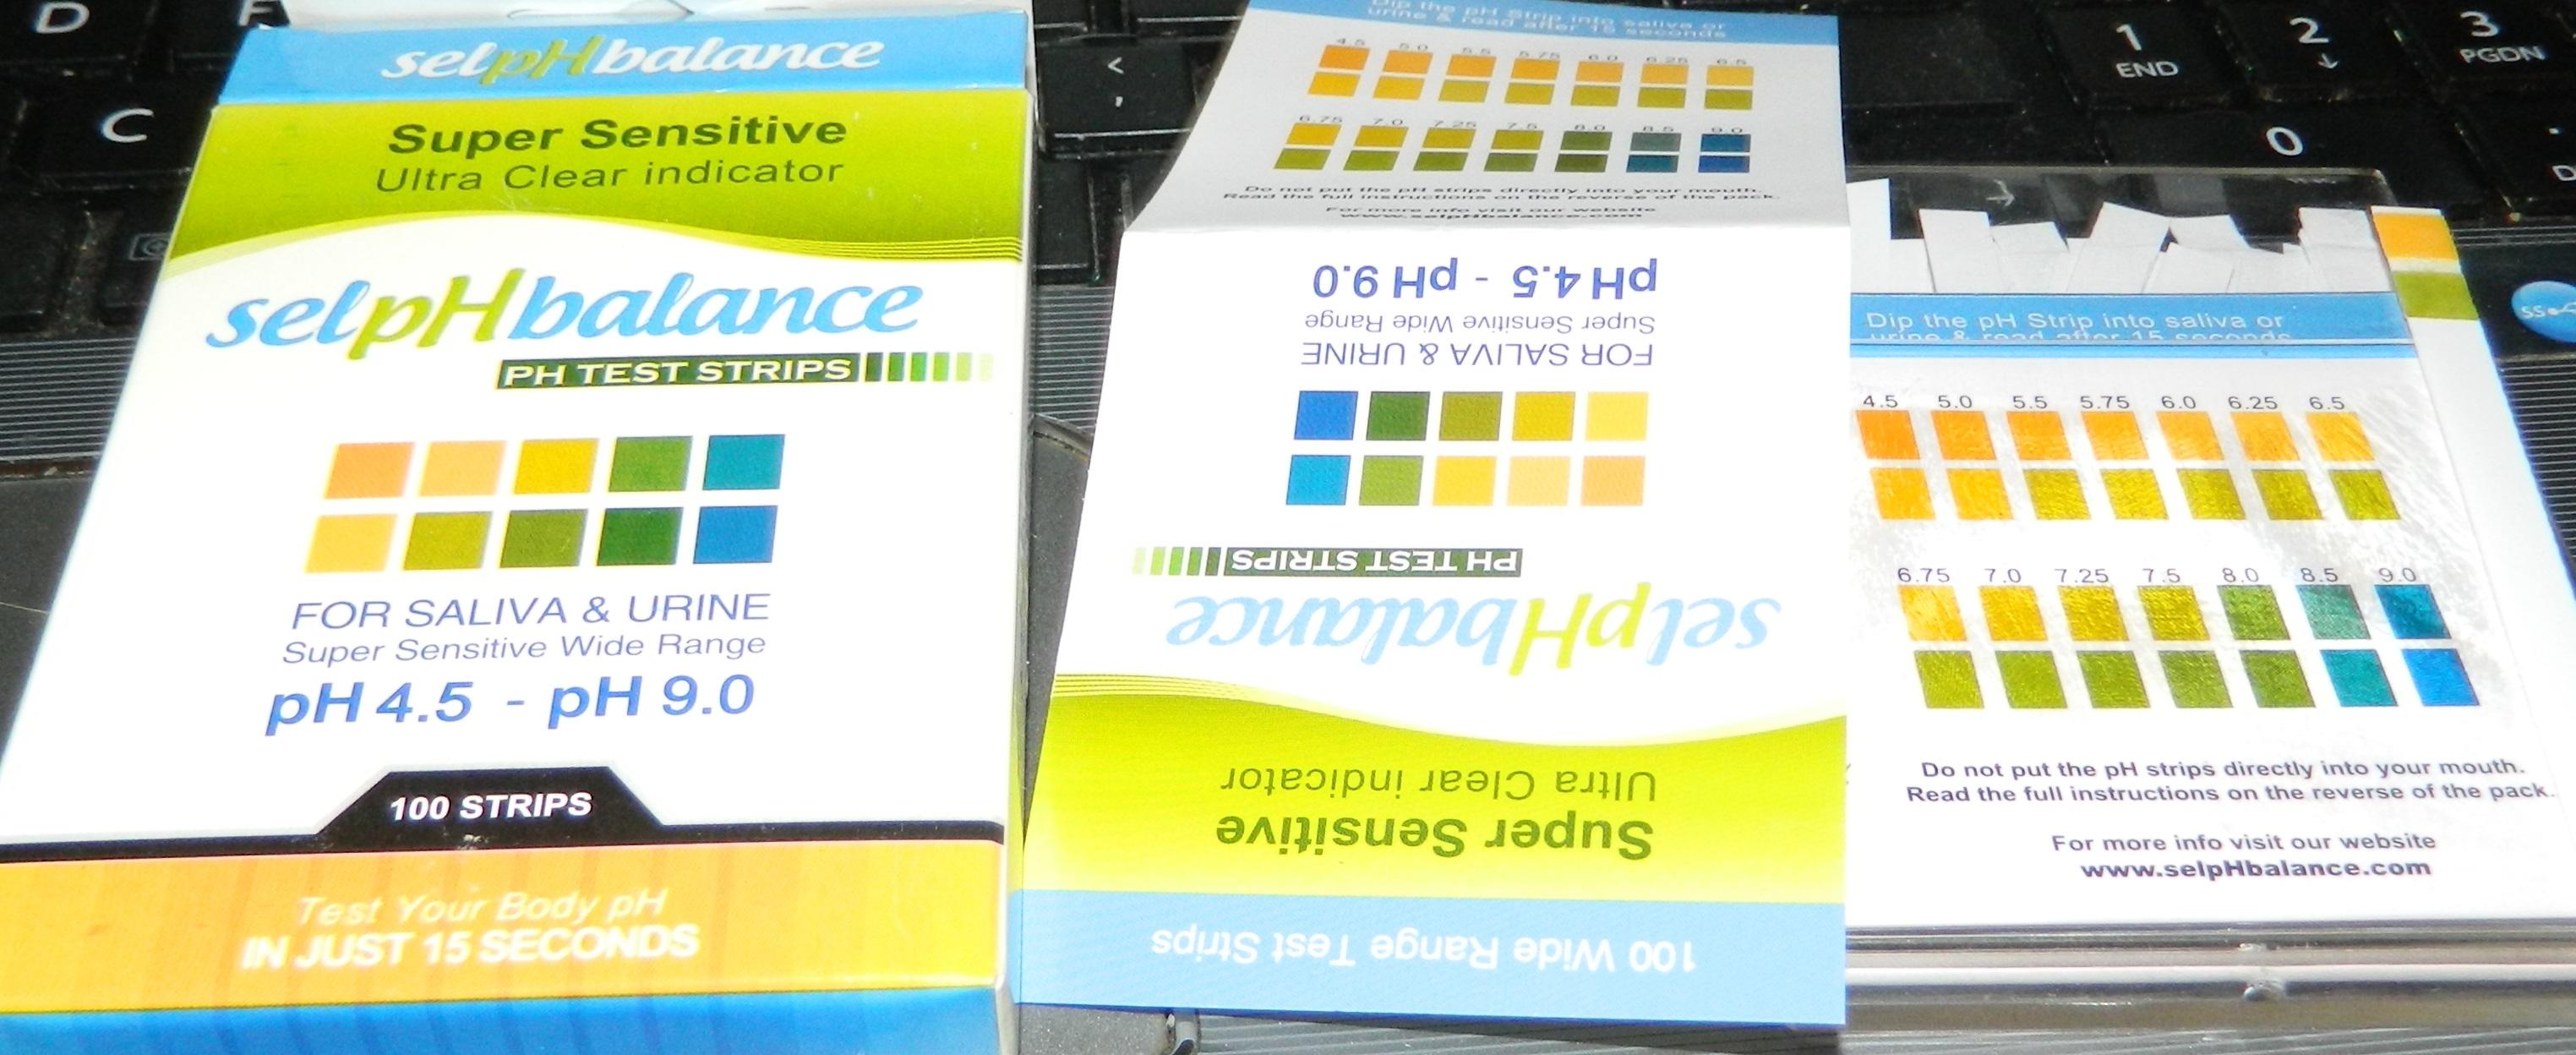 SelpHbalance pH Test Strips